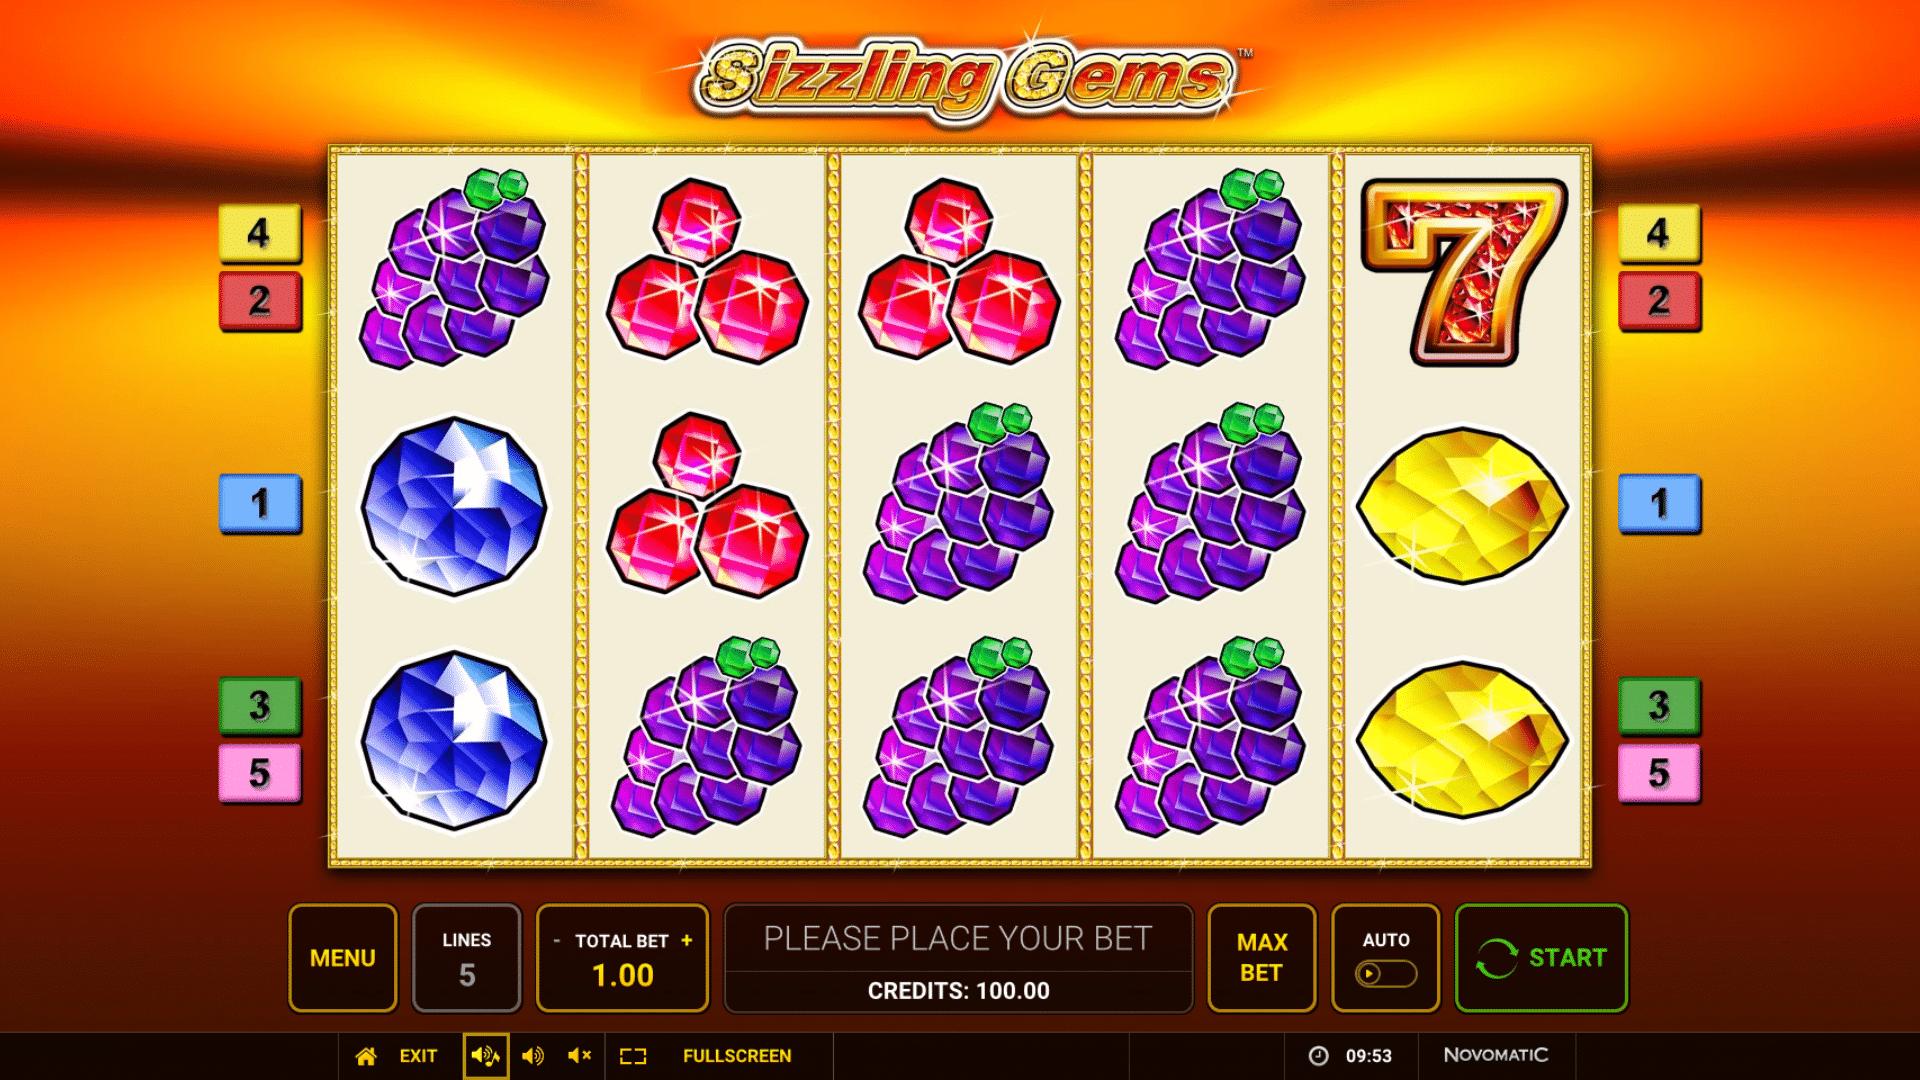 Slot Sizzling Gems